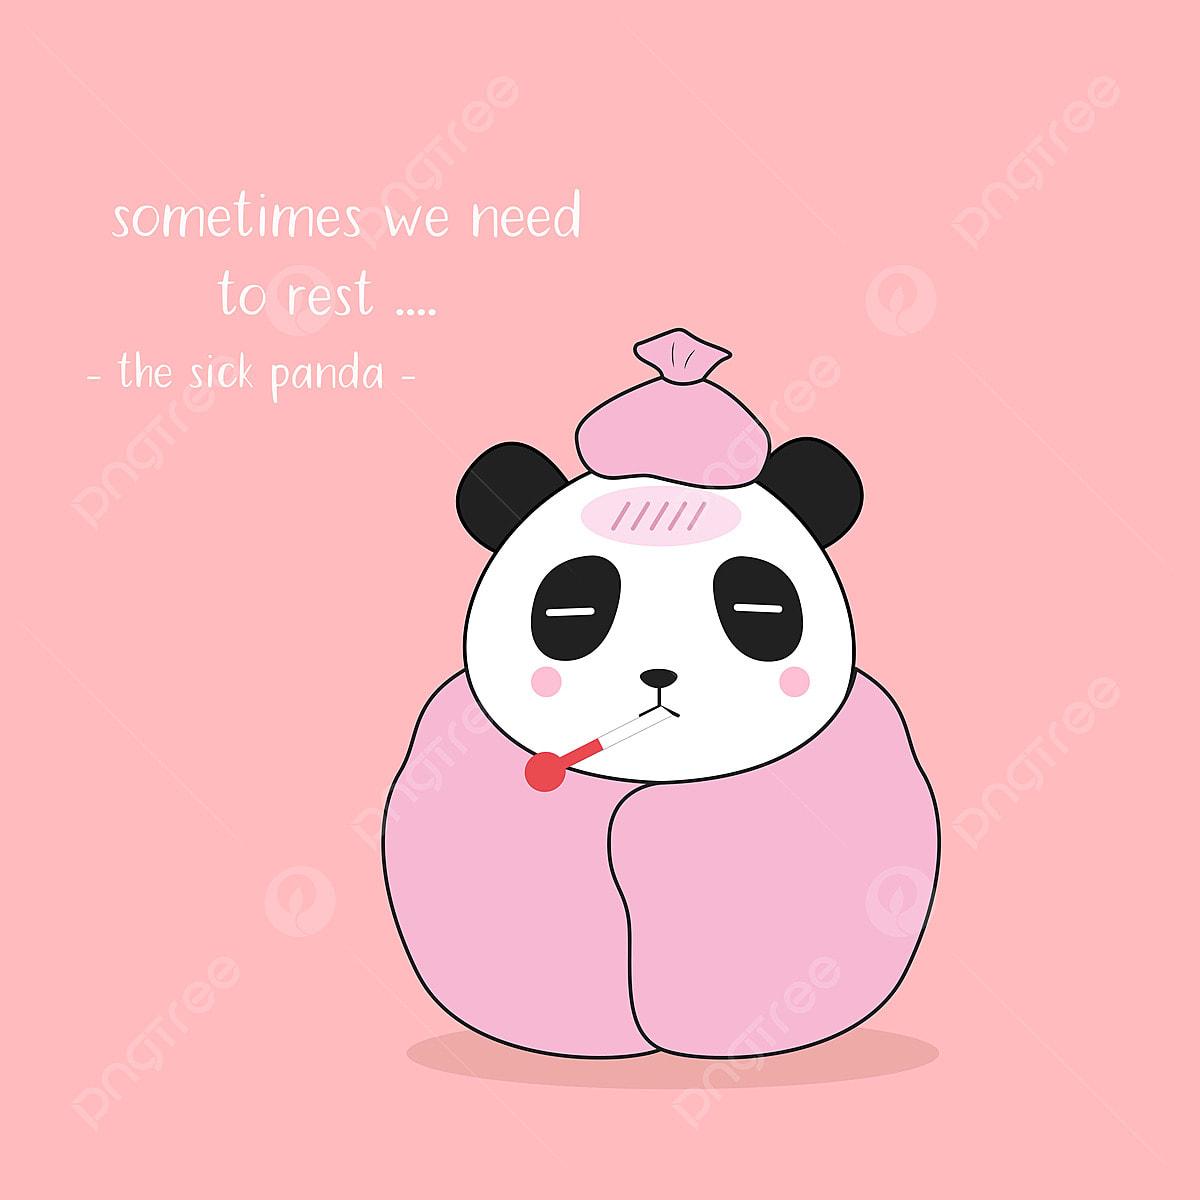 Watak Panda El Yang Sakit Dalam Gaya Kartun Nikmati